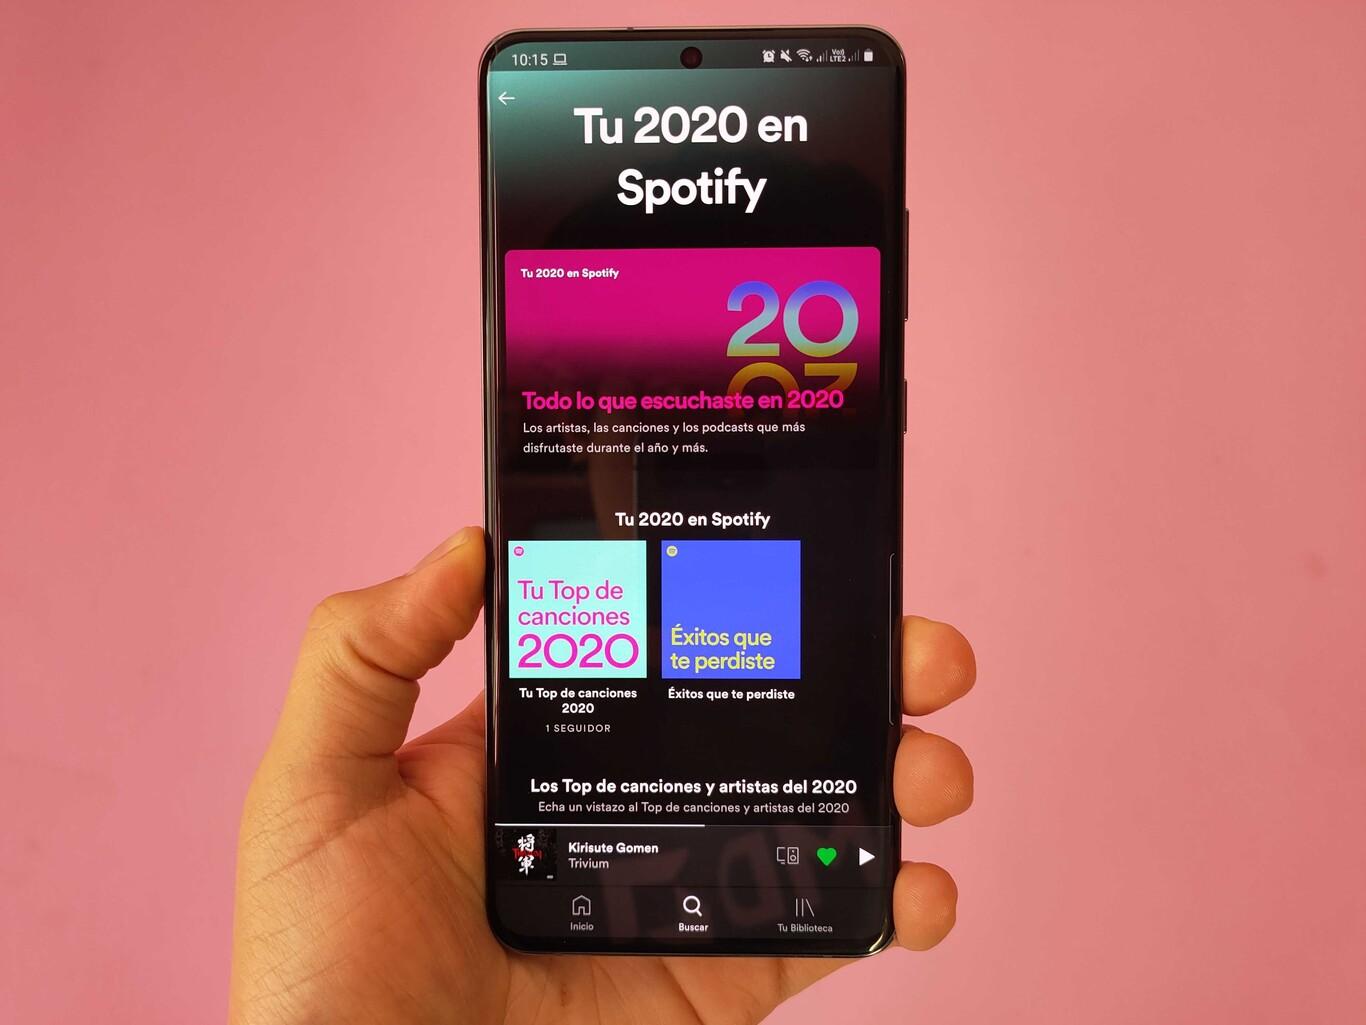 interfaz de Spotify Wrapped